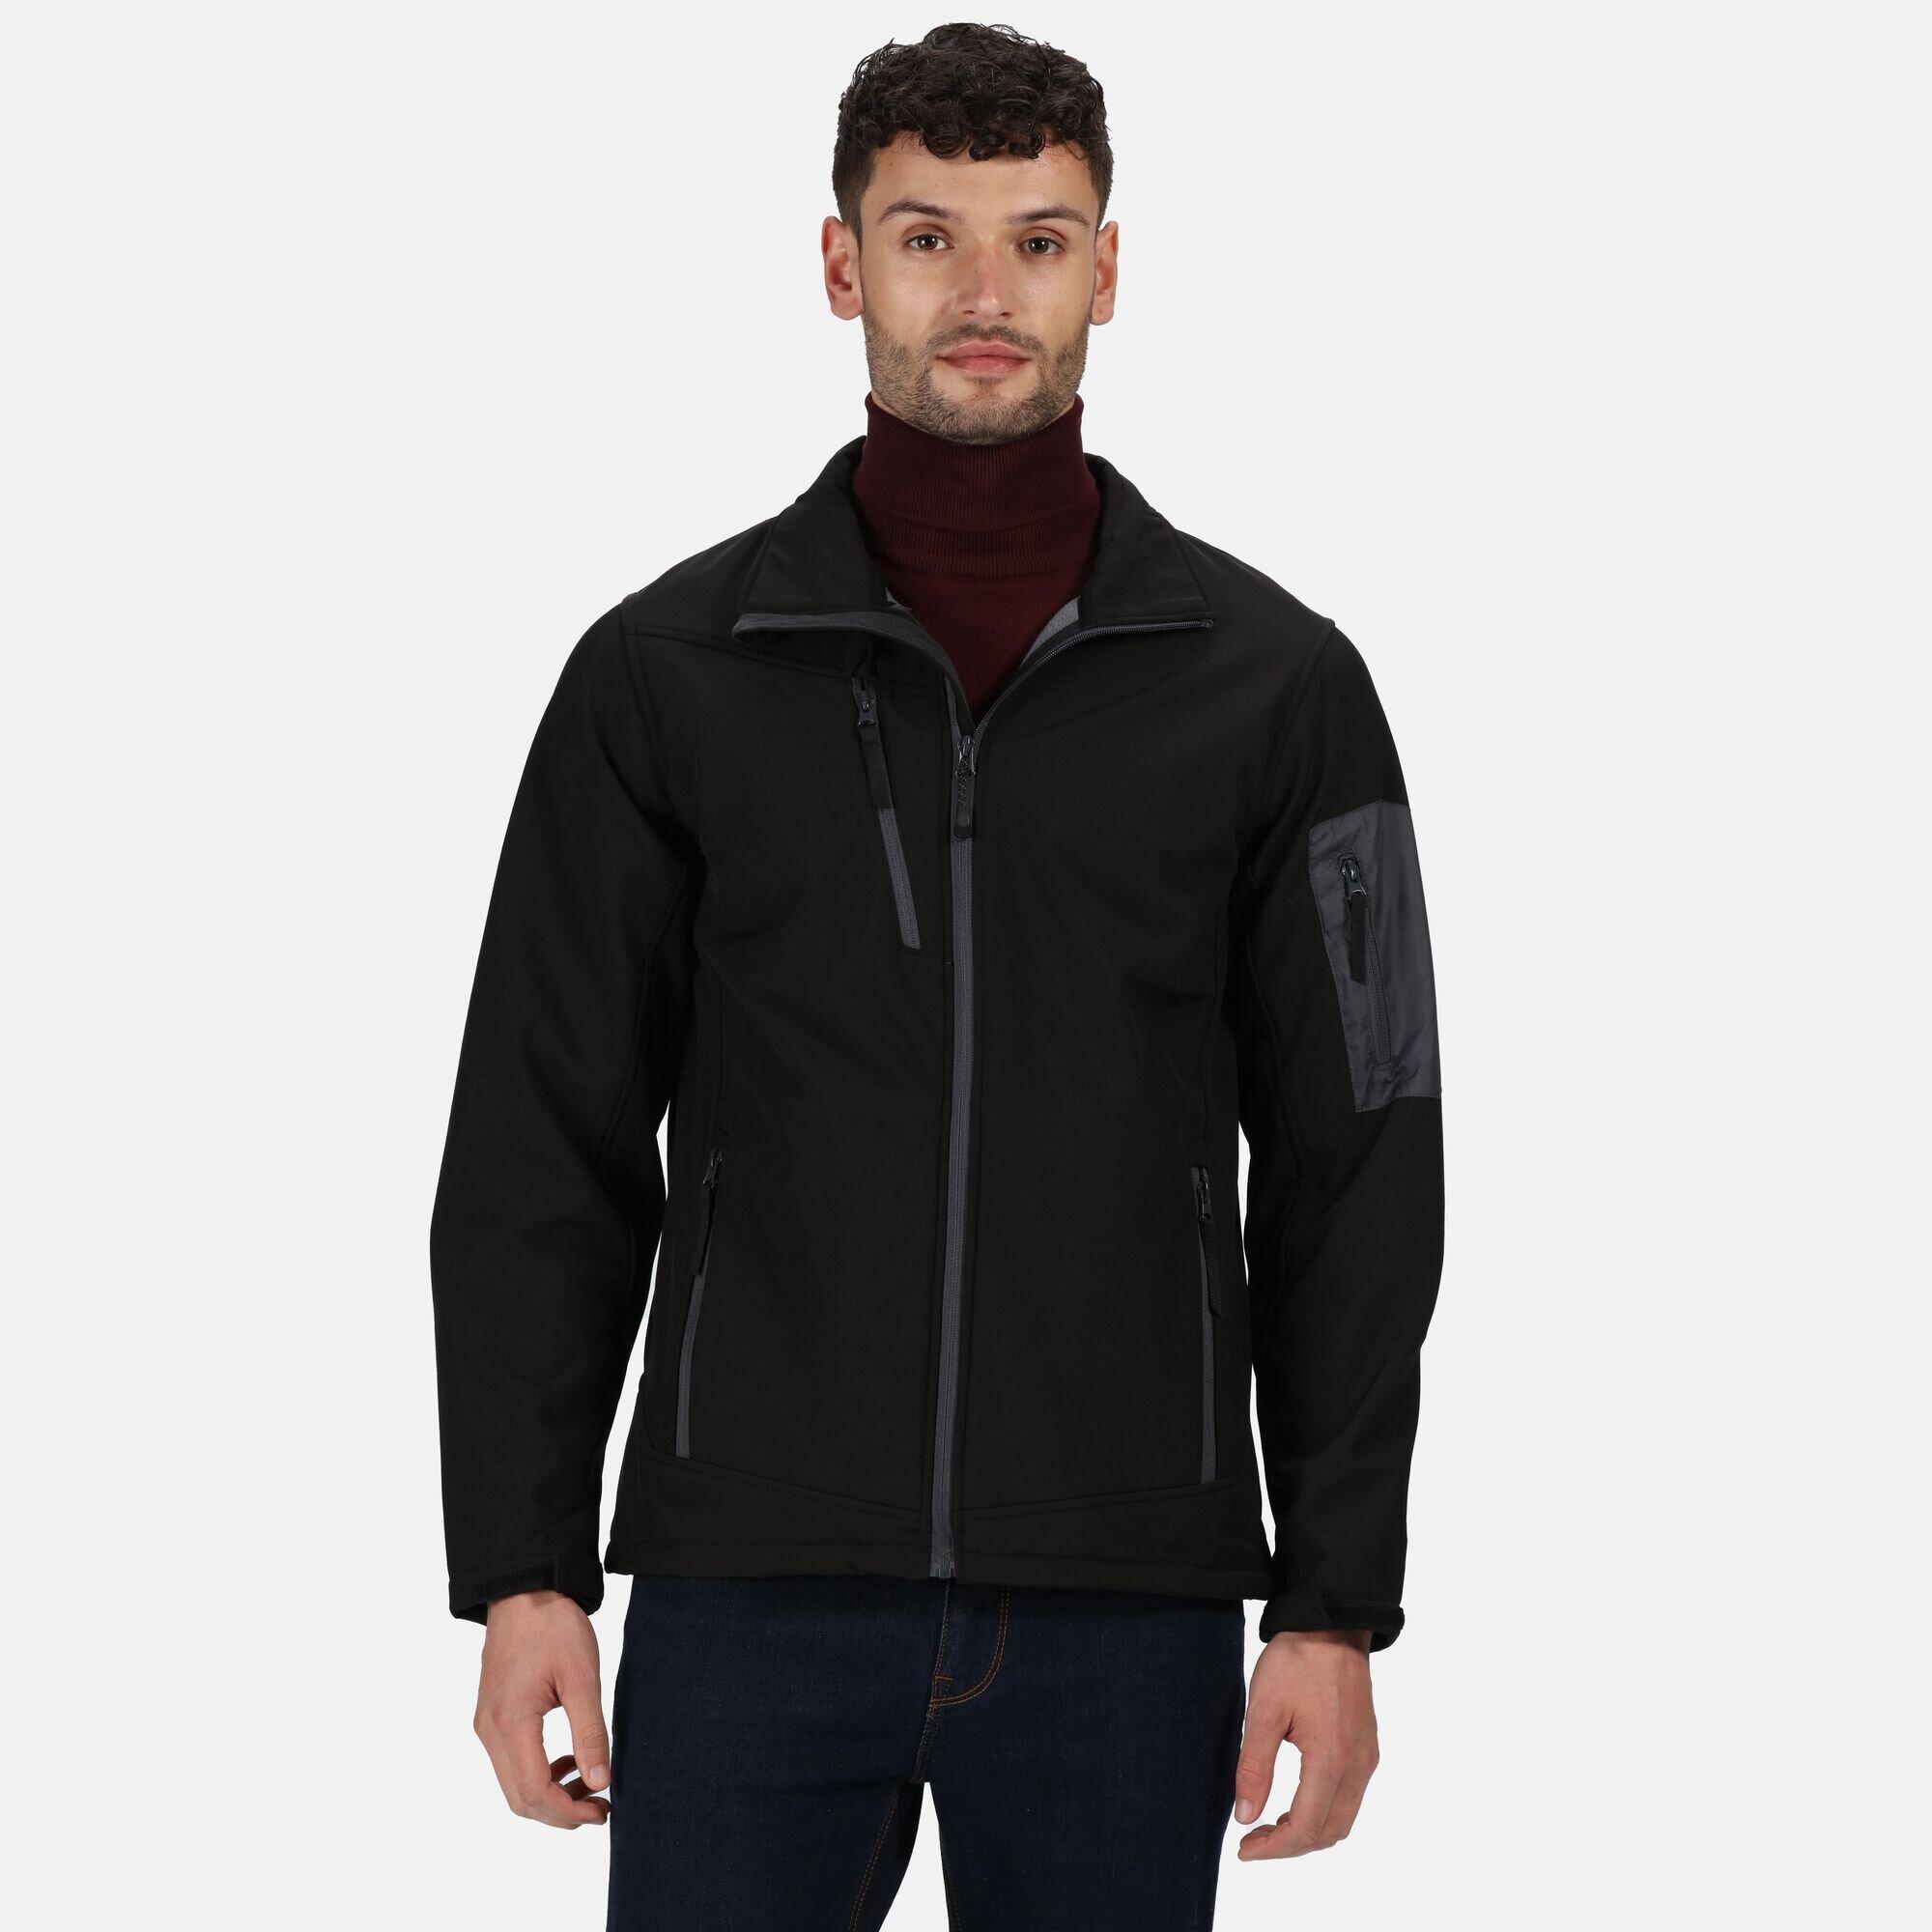 Regatta Arcola 3 Layer Softshell Jacket